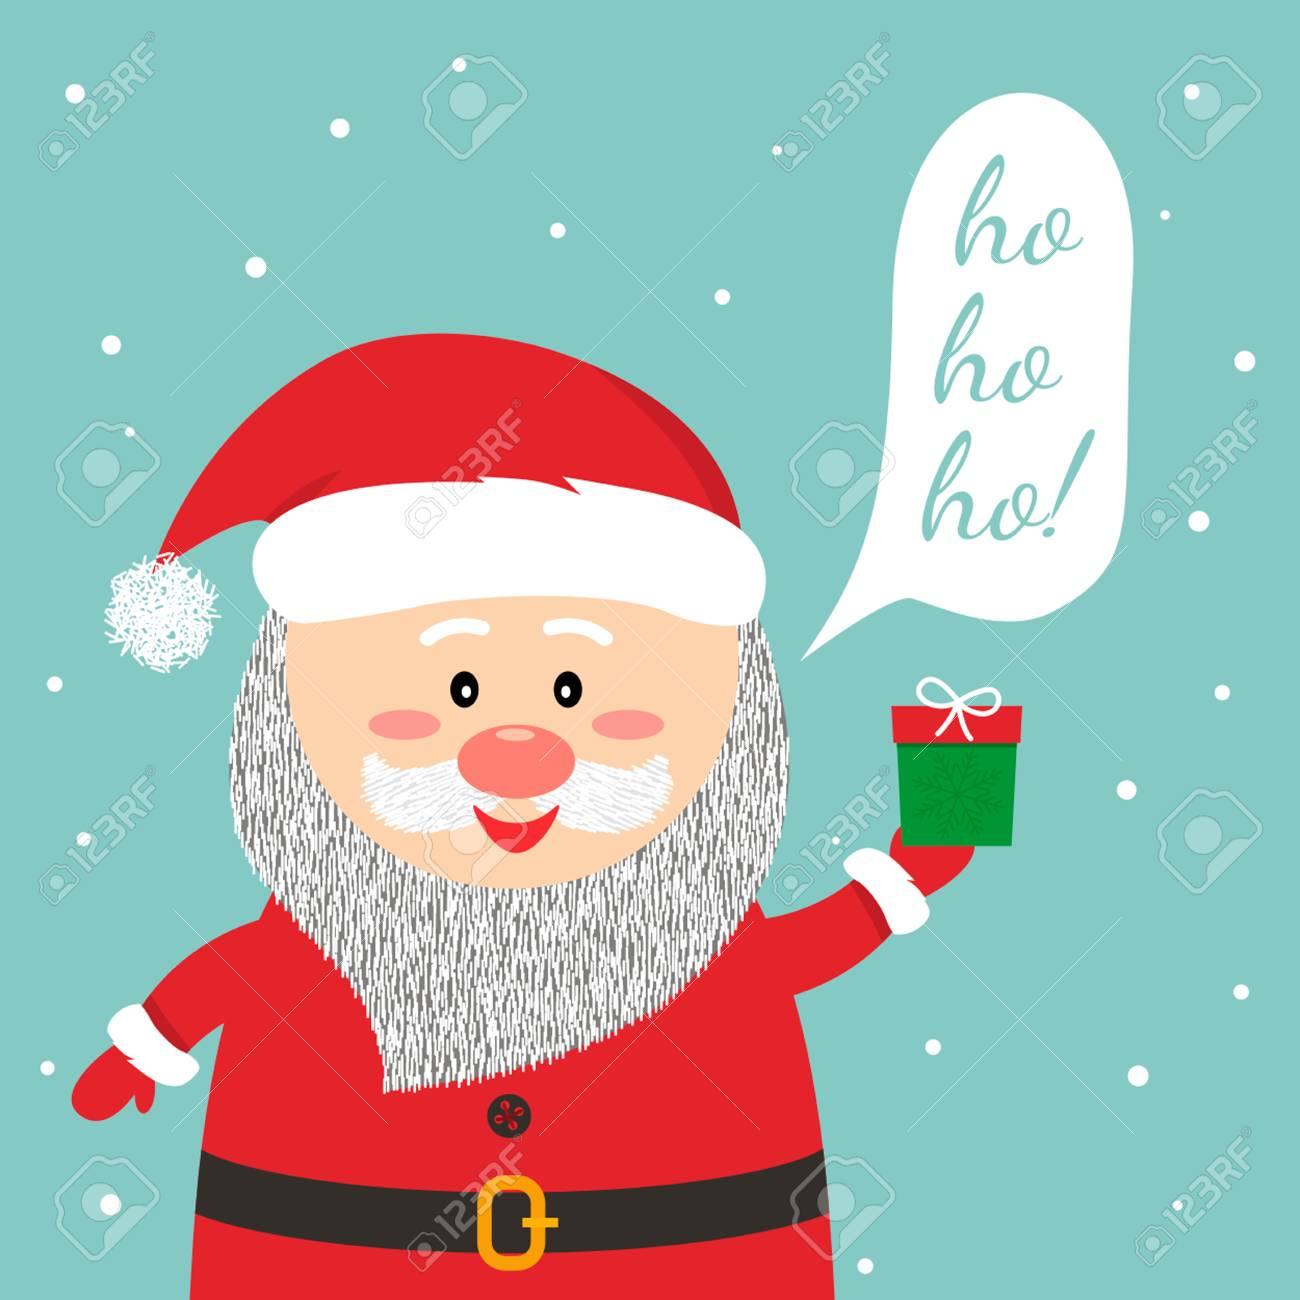 Funny christmas greetings card funny santa claus says ho ho ho funny christmas greetings card funny santa claus says m4hsunfo Image collections